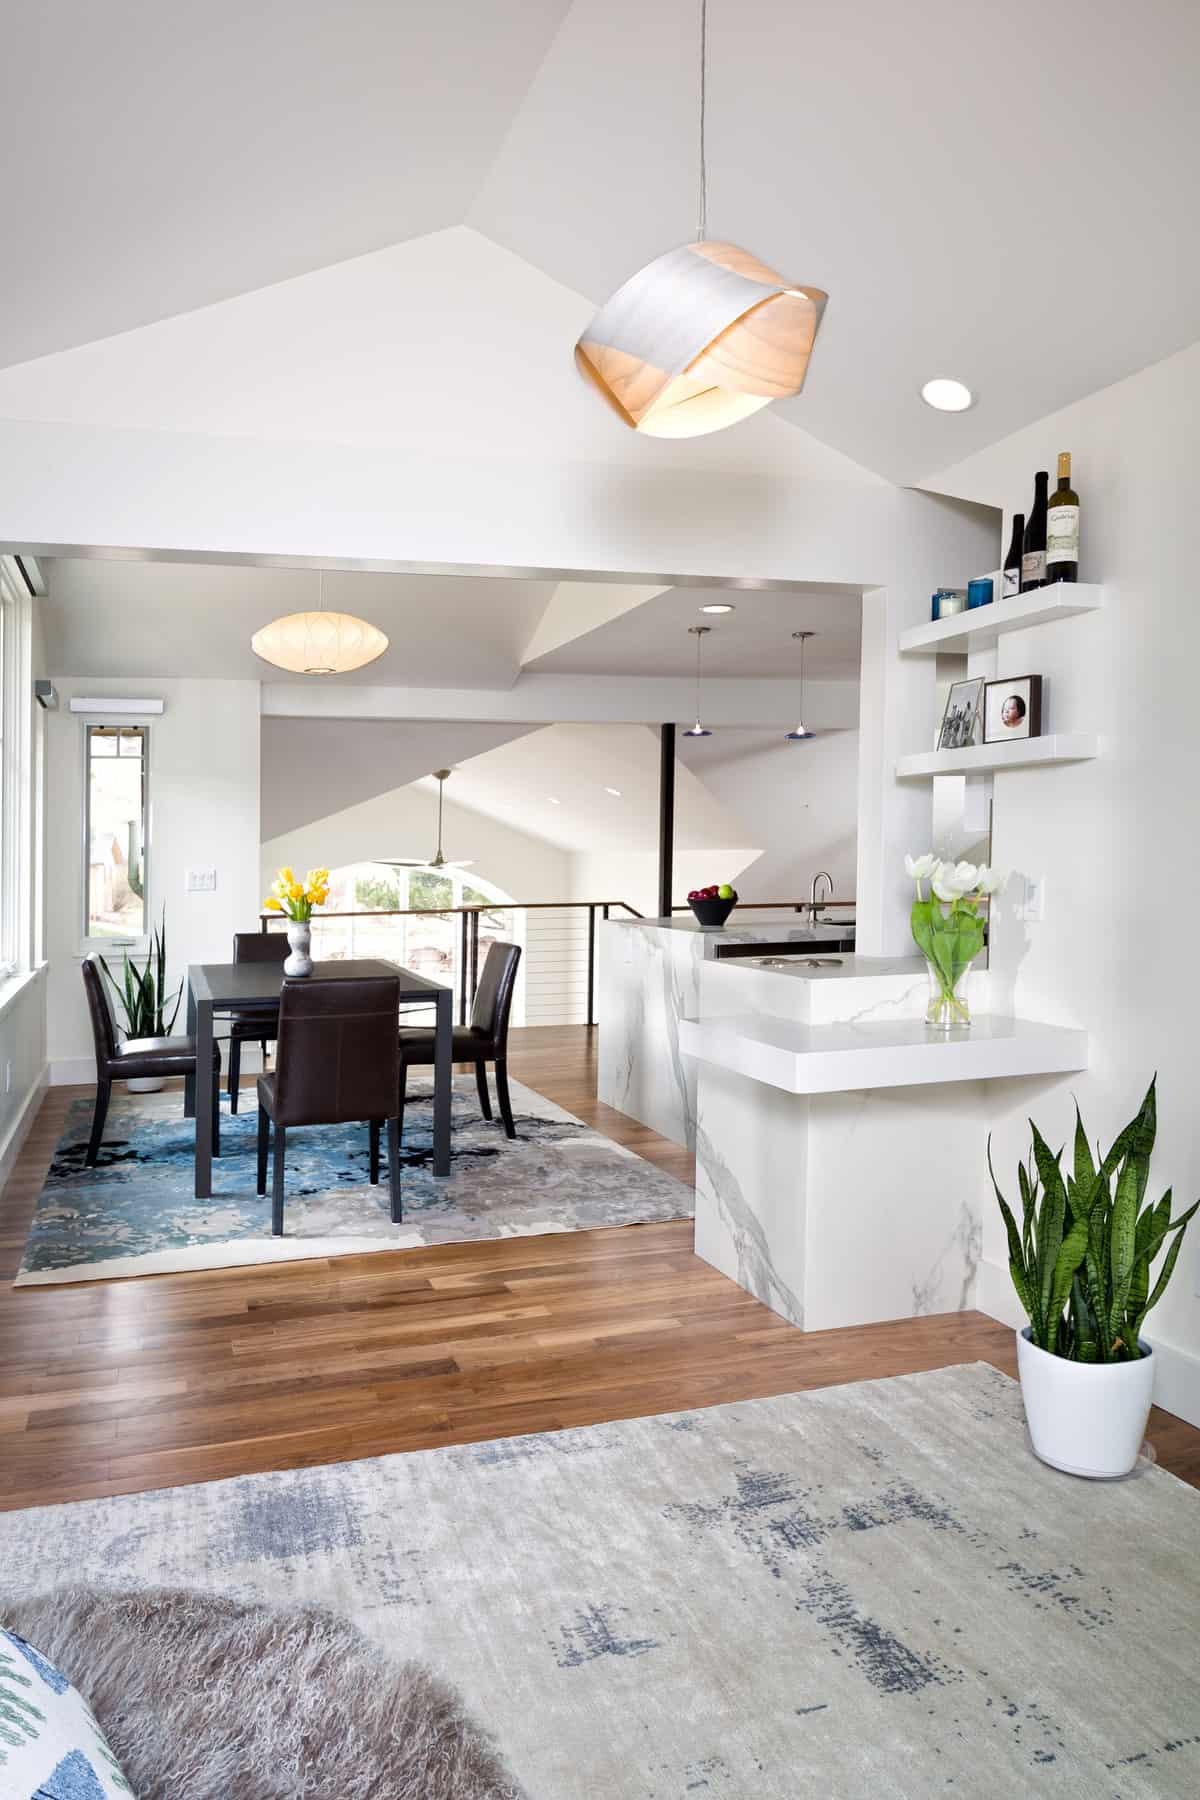 Devil's Thumb Boulder Remodel - Den to Dining Room Kitchen and Living Room